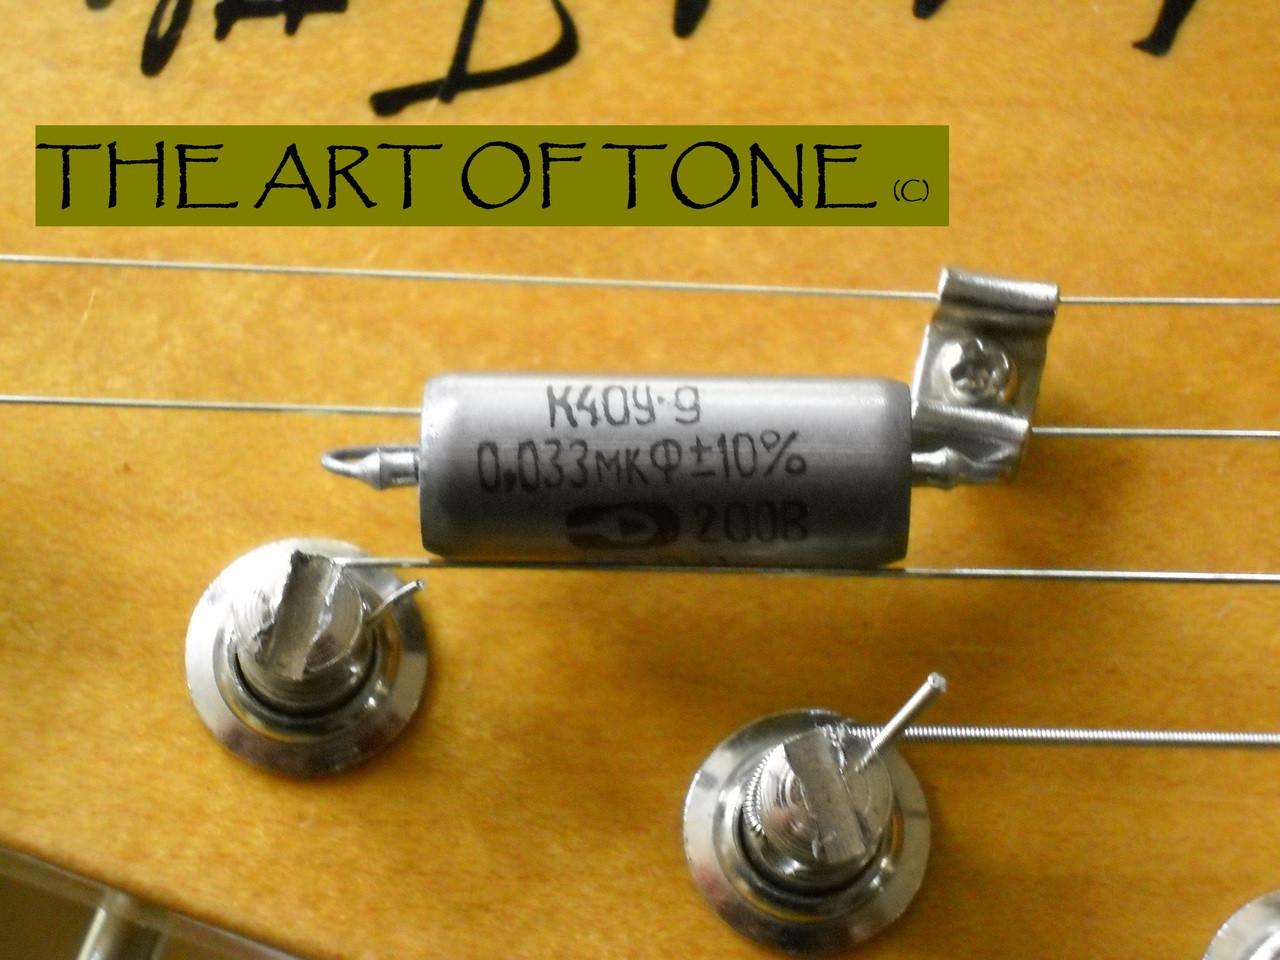 Russian K40Y-9 .033uf@200v The Art Of Tone TAOT